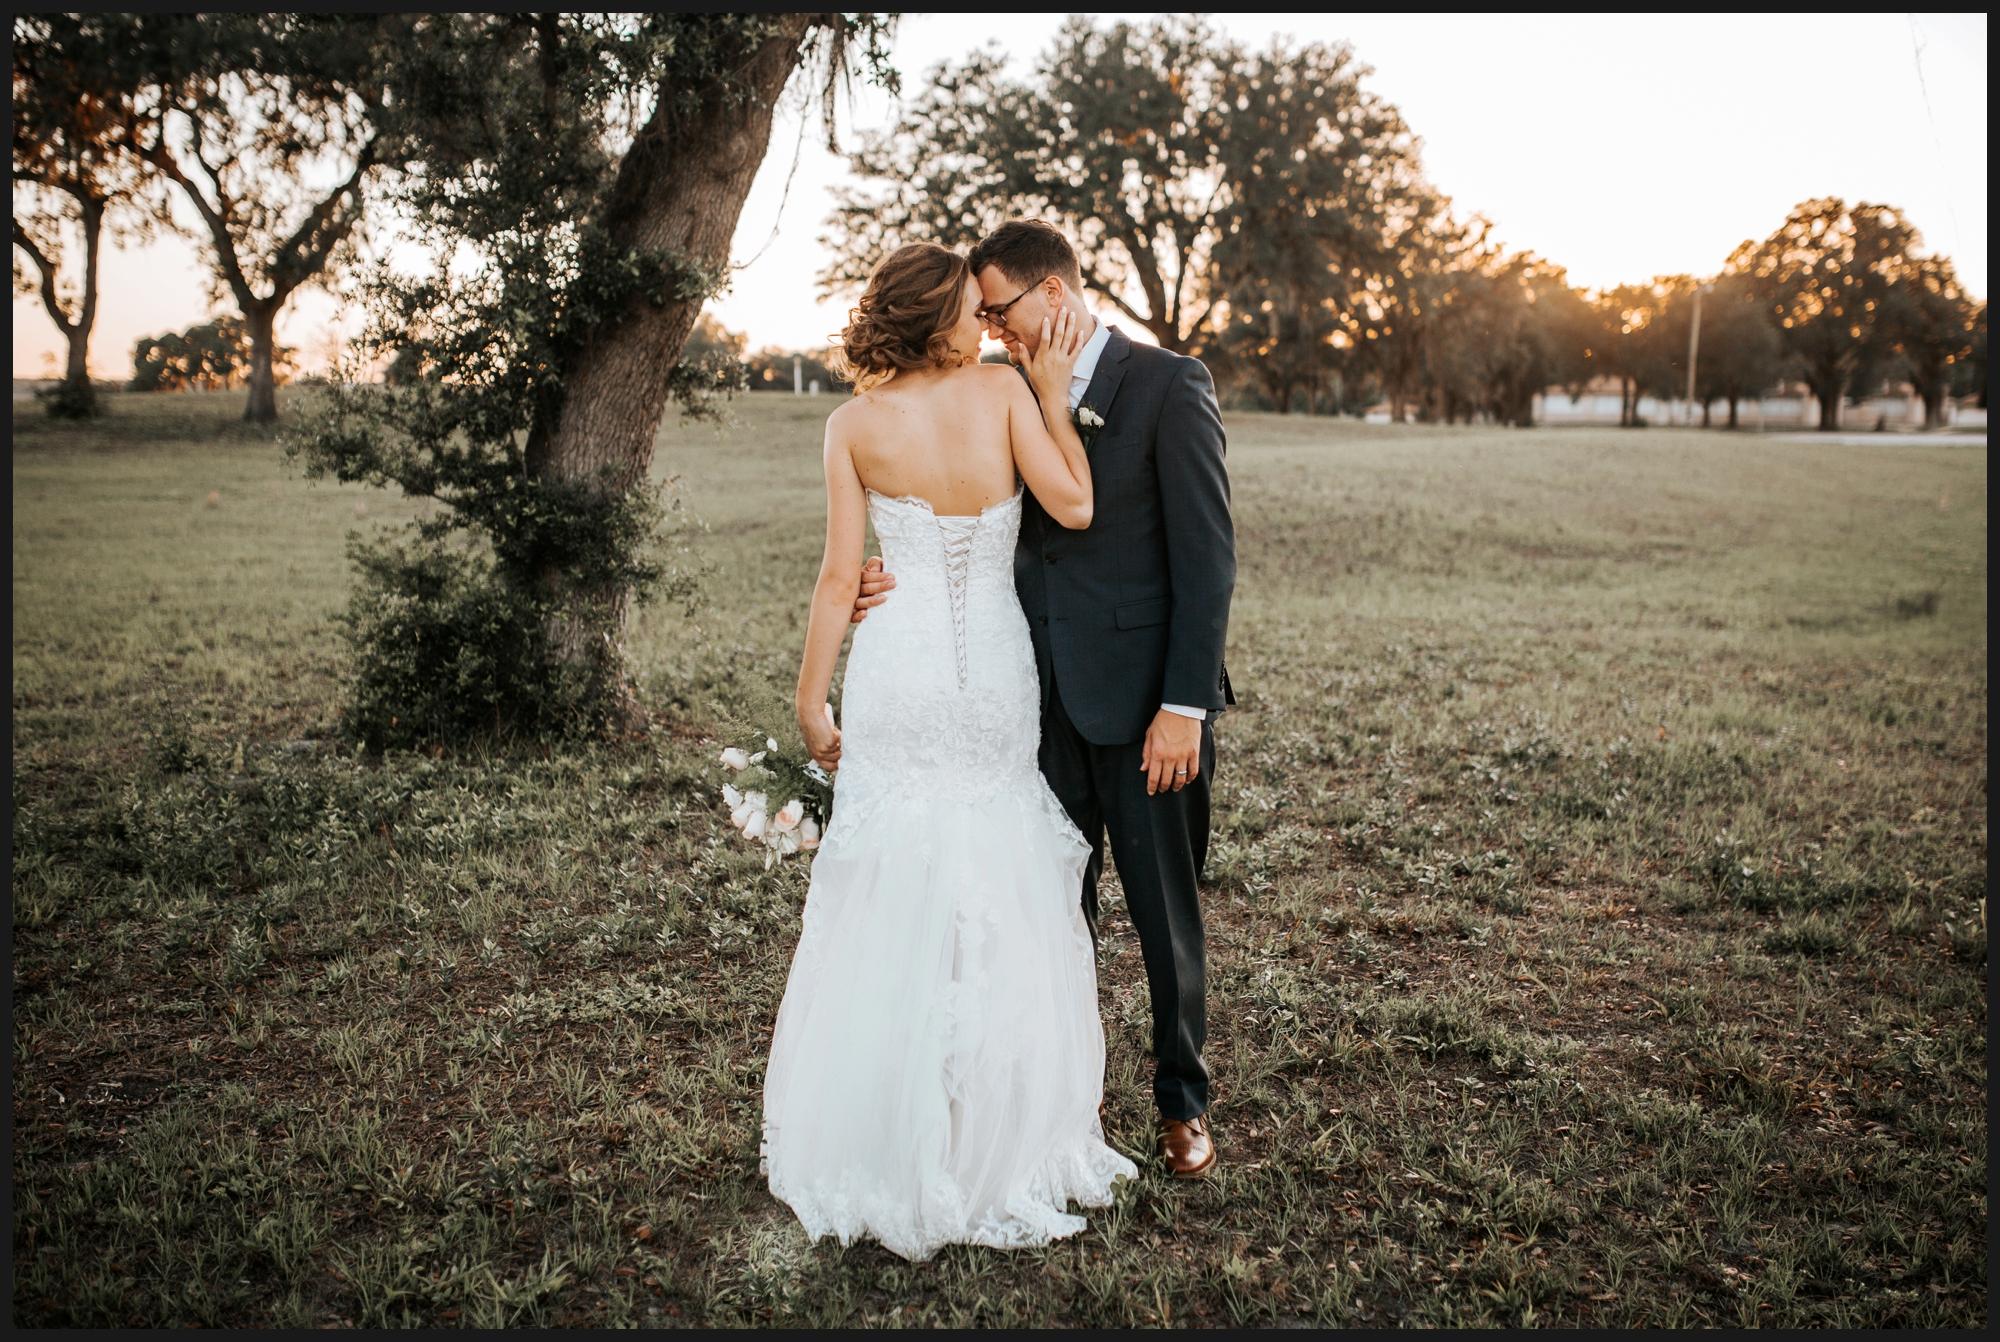 Orlando-Wedding-Photographer-destination-wedding-photographer-florida-wedding-photographer-bohemian-wedding-photographer_0113.jpg